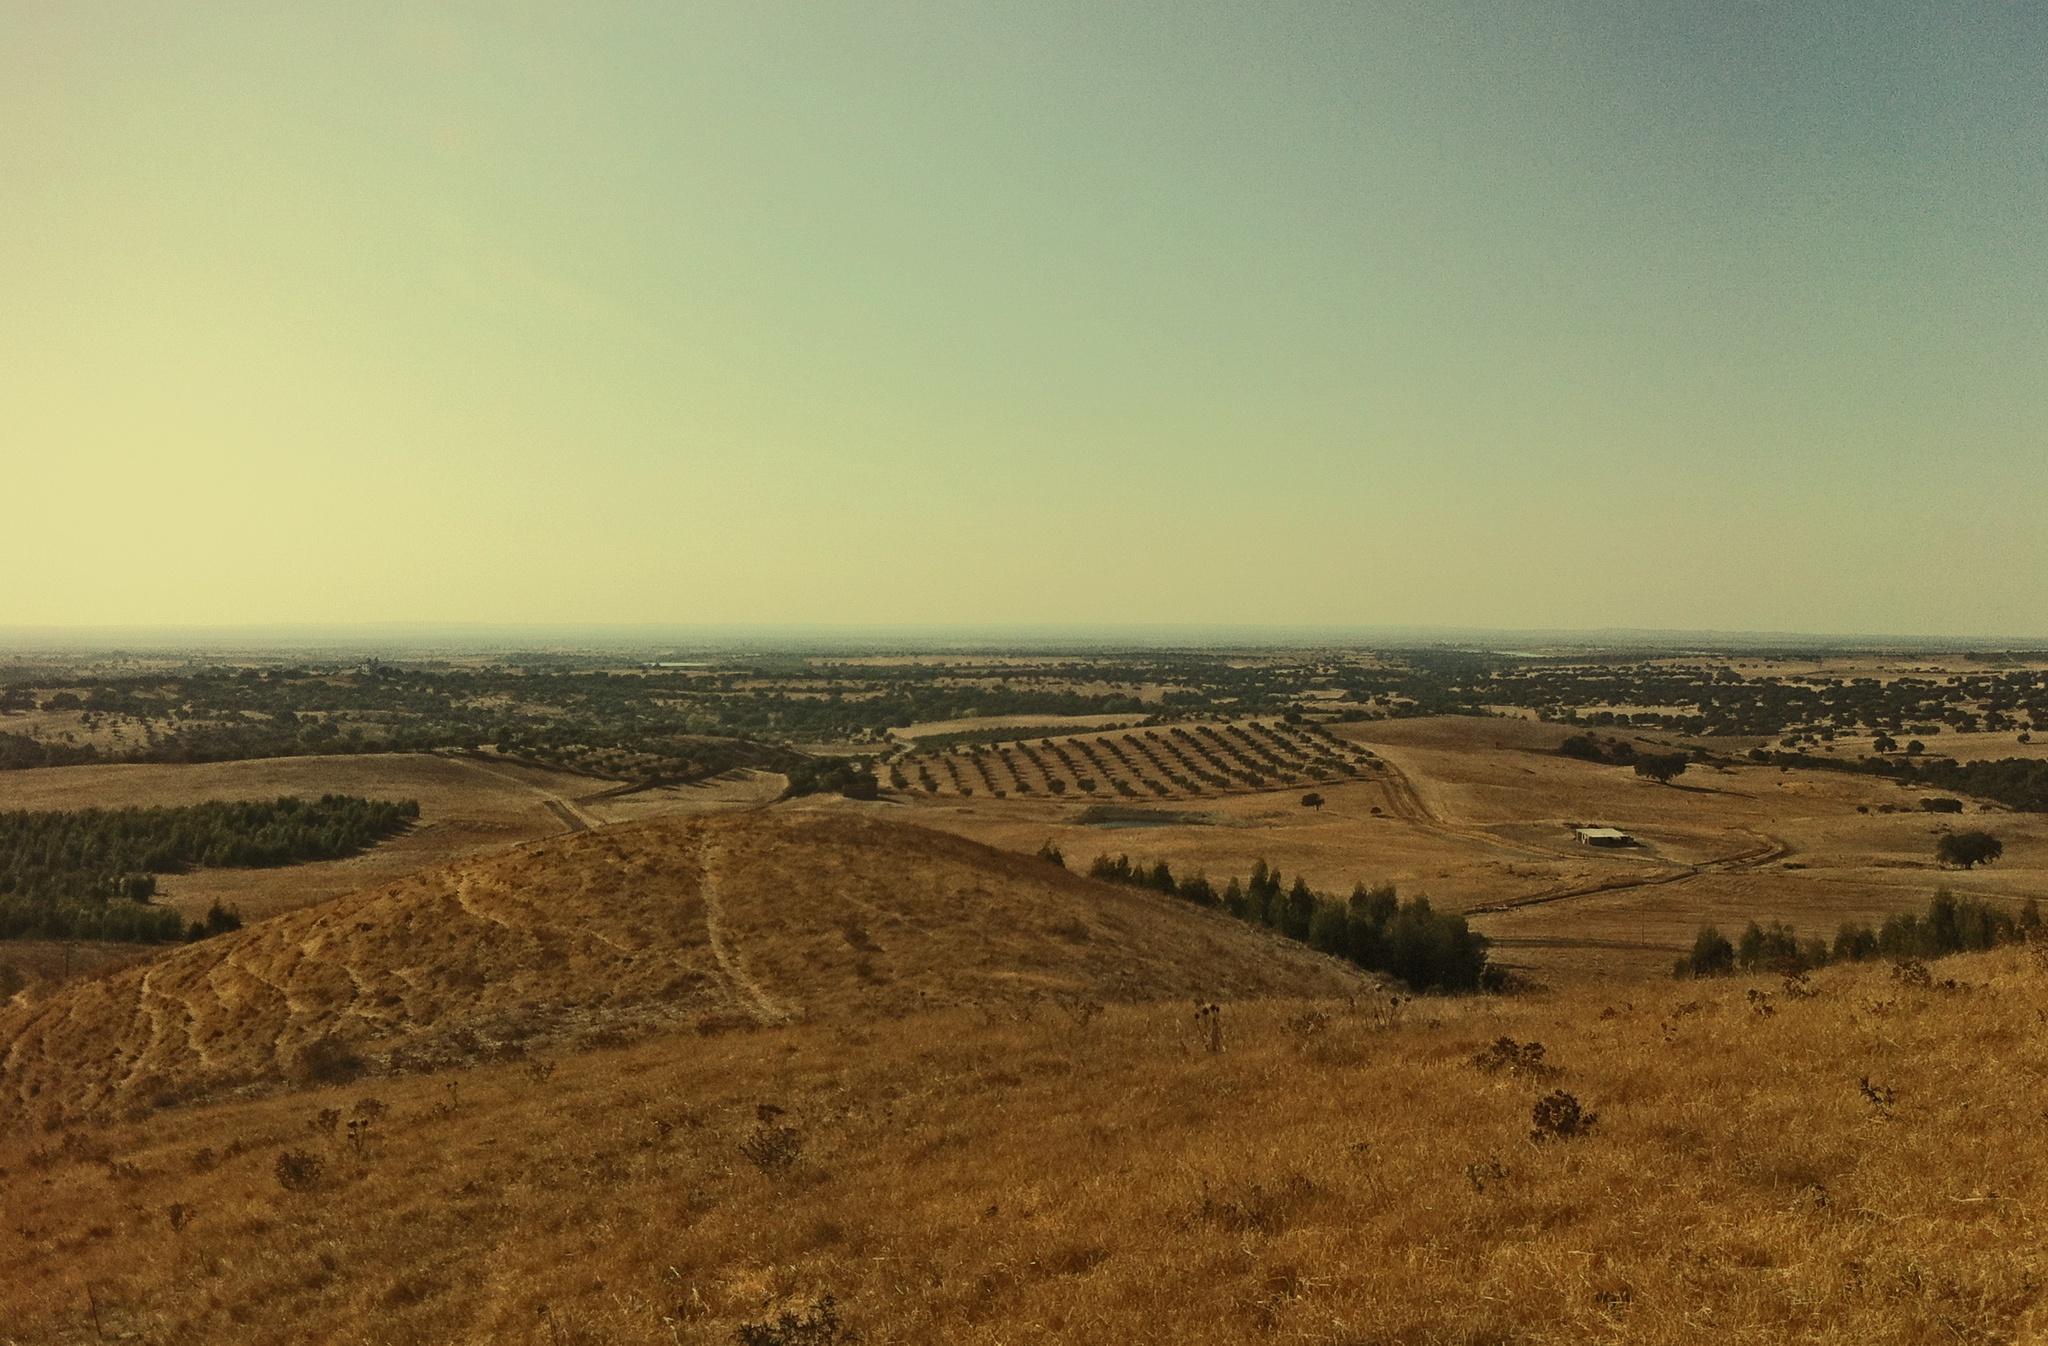 The Alentejo Plains by Nuno Maldonado Tuna